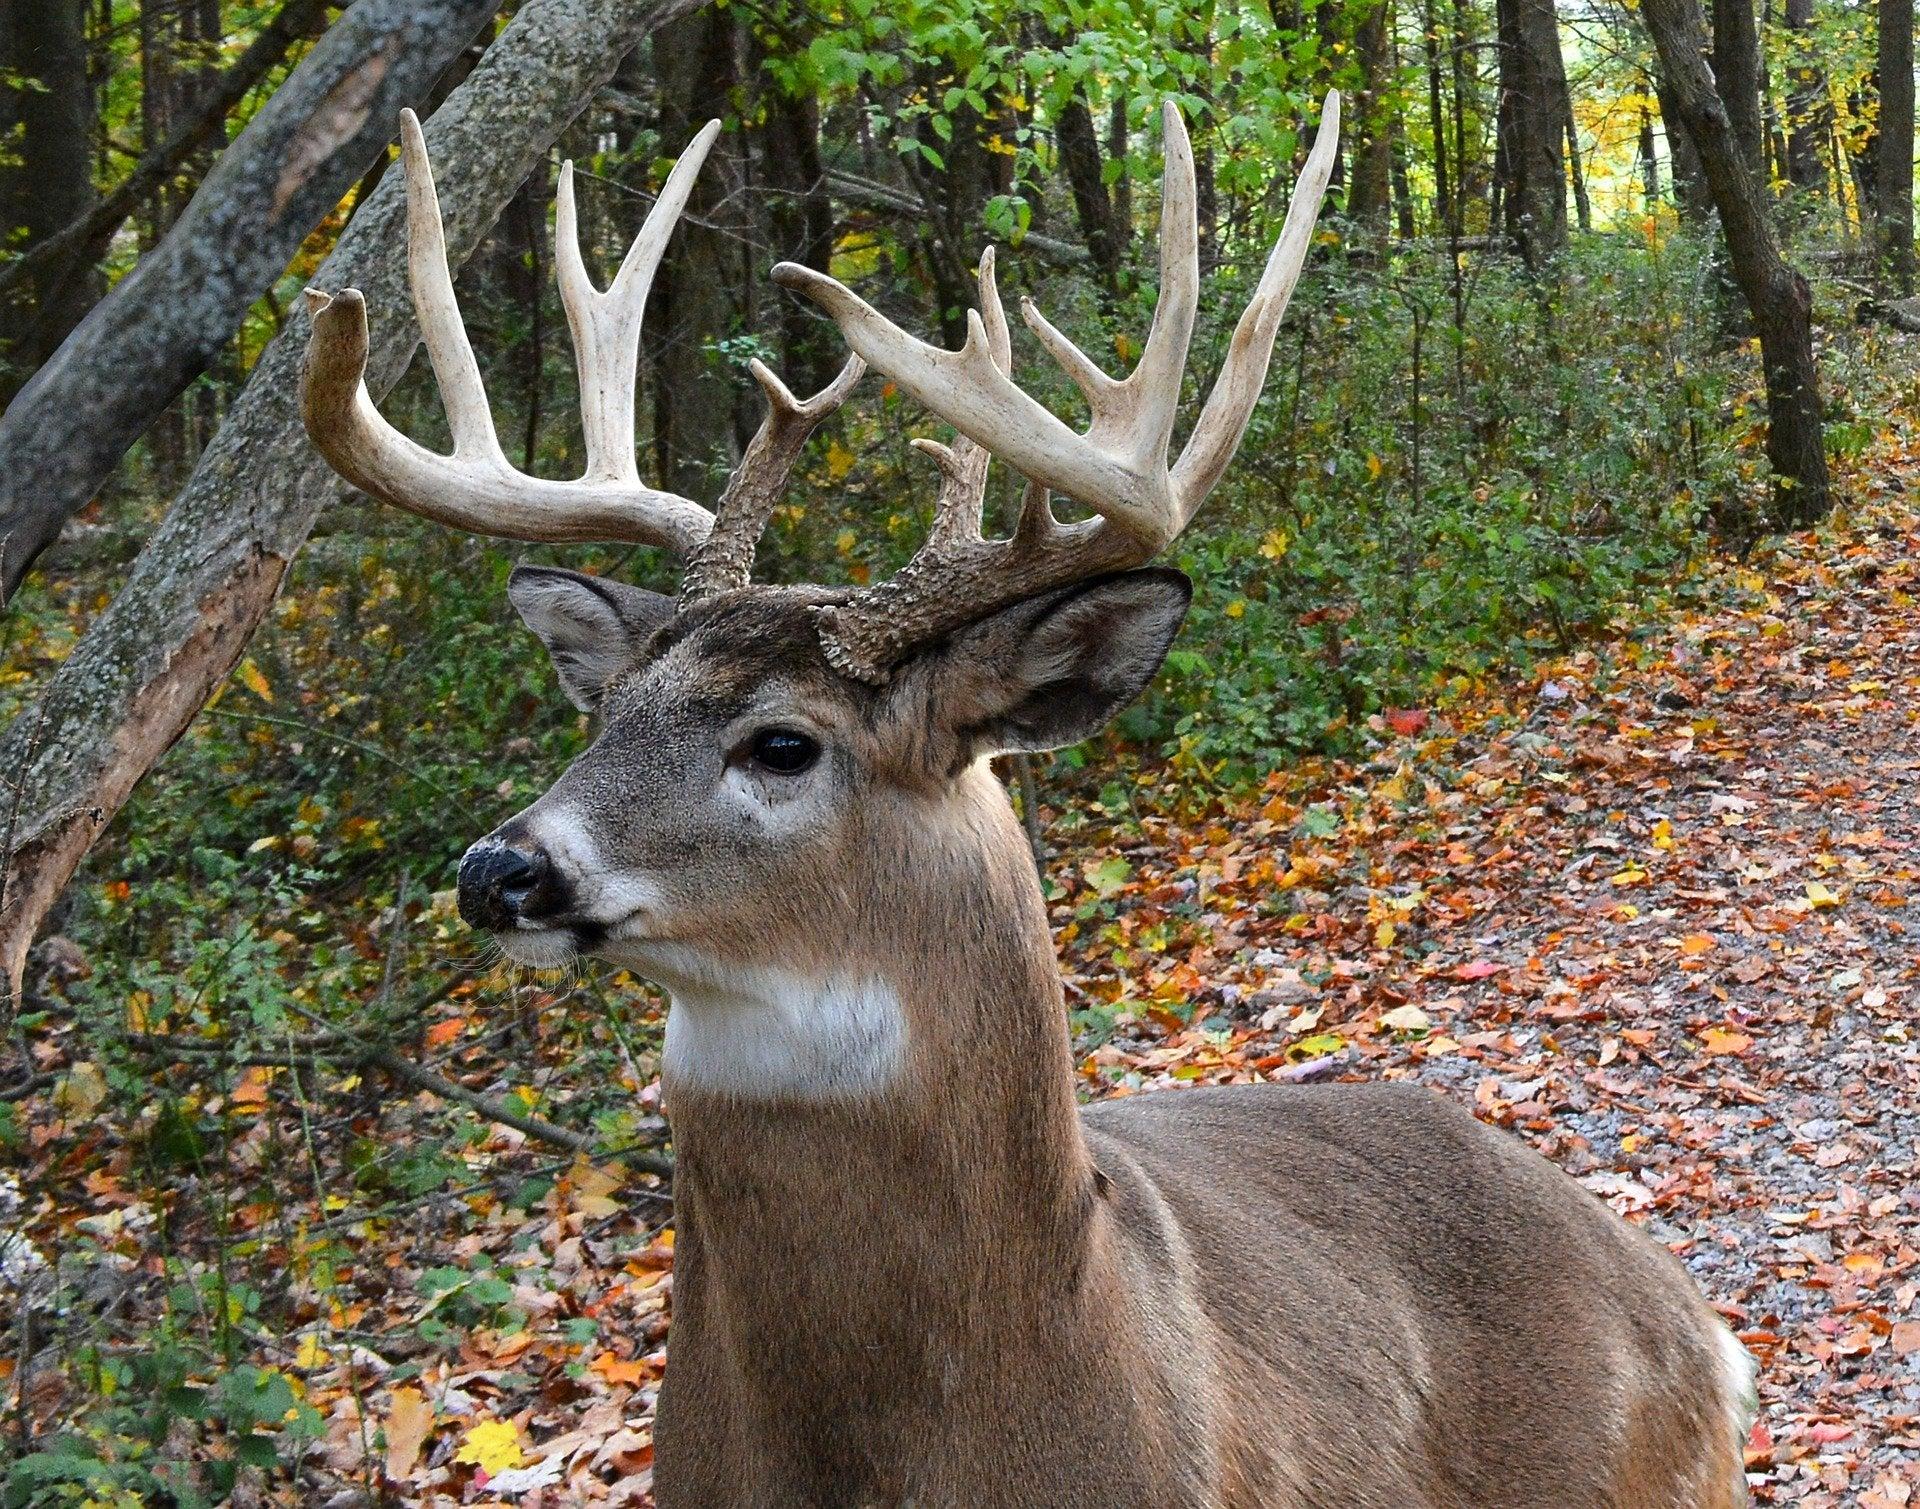 Major Pennsylvania Hunting Season Changes